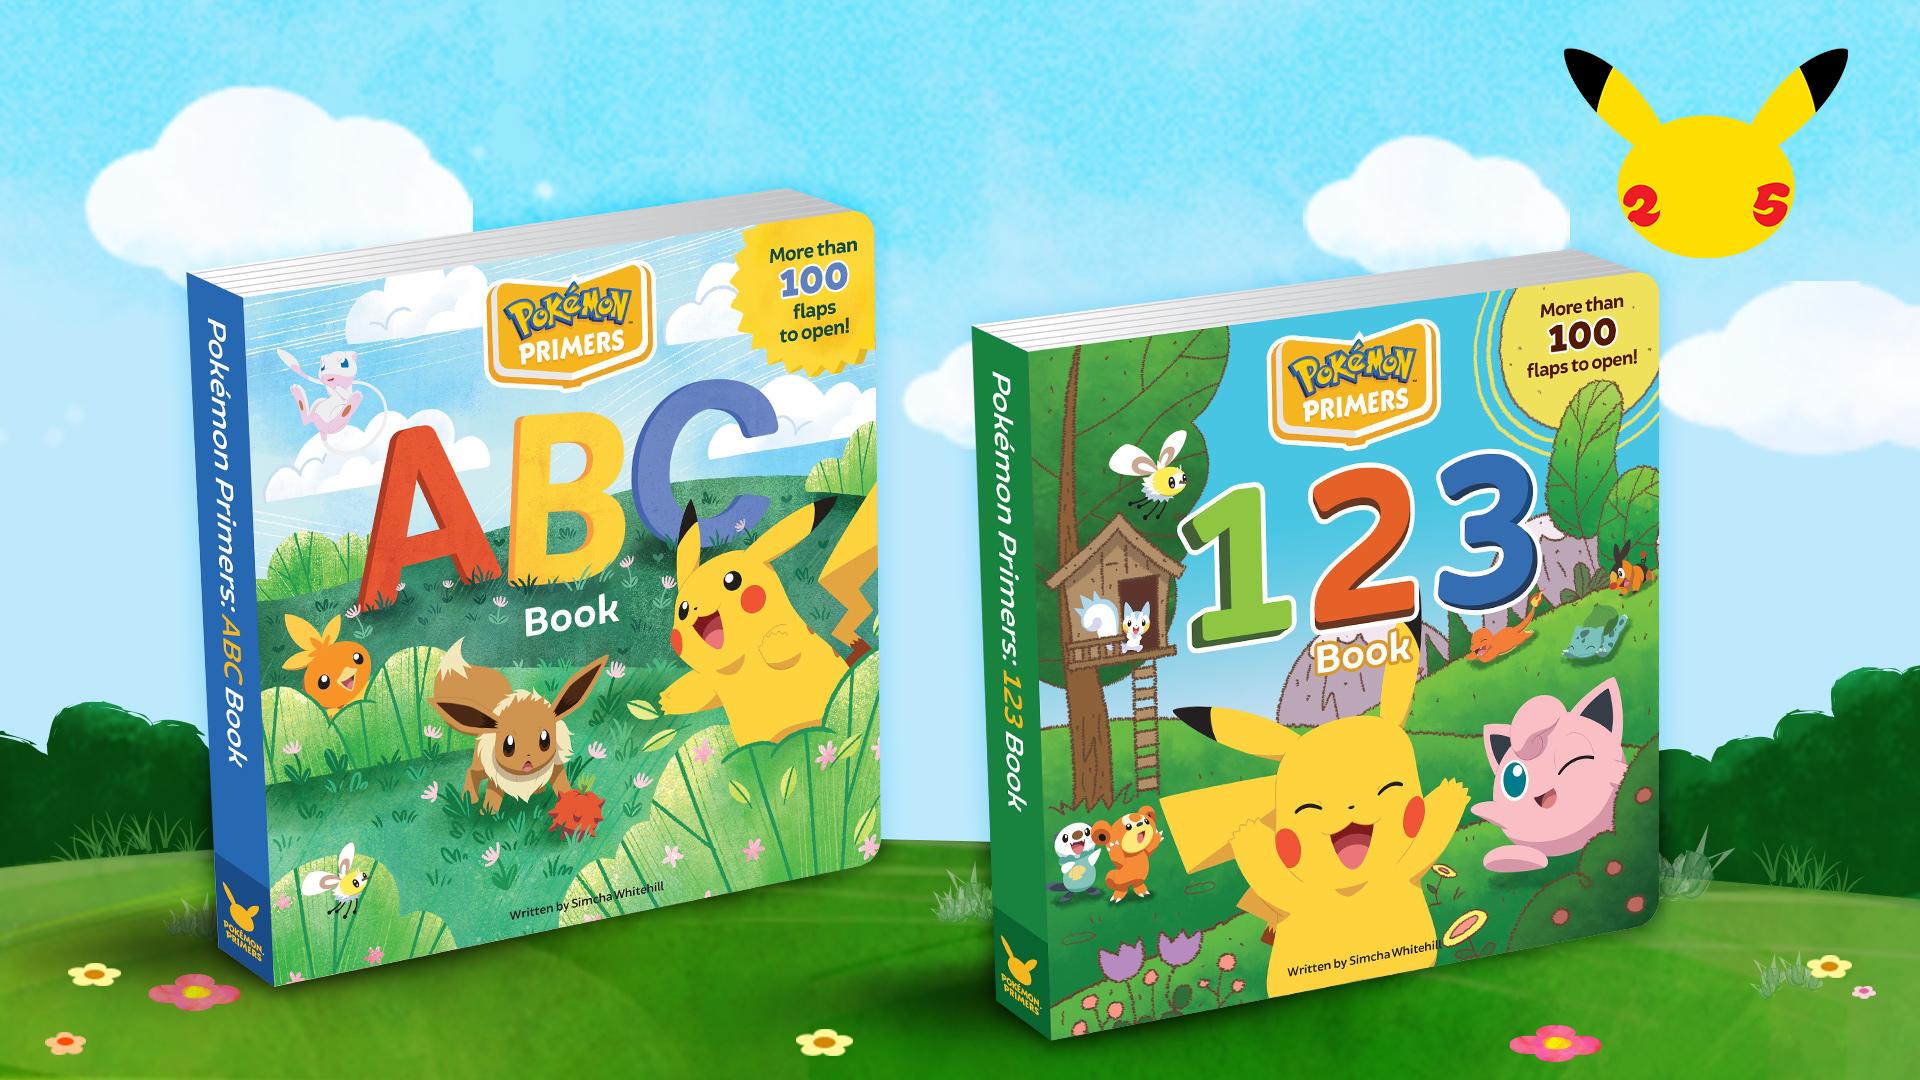 Pokémon-Primer-Books